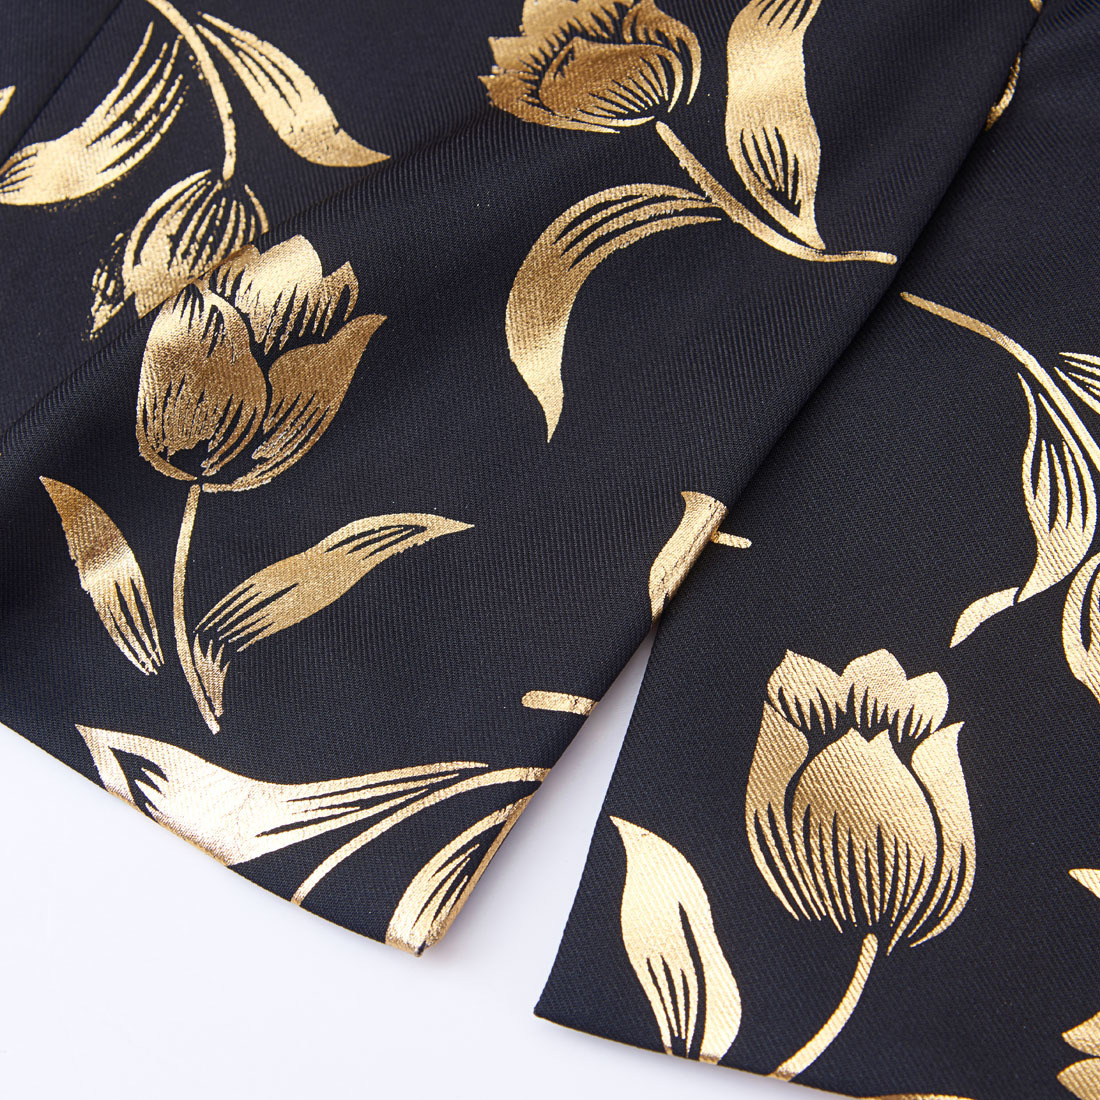 PYJTRL Stylish Gold Tulips Pattern Casual Blazer Men Suit Jacket British Gentleman Wedding Grooms Slim Fit Fashion Coat Outfit